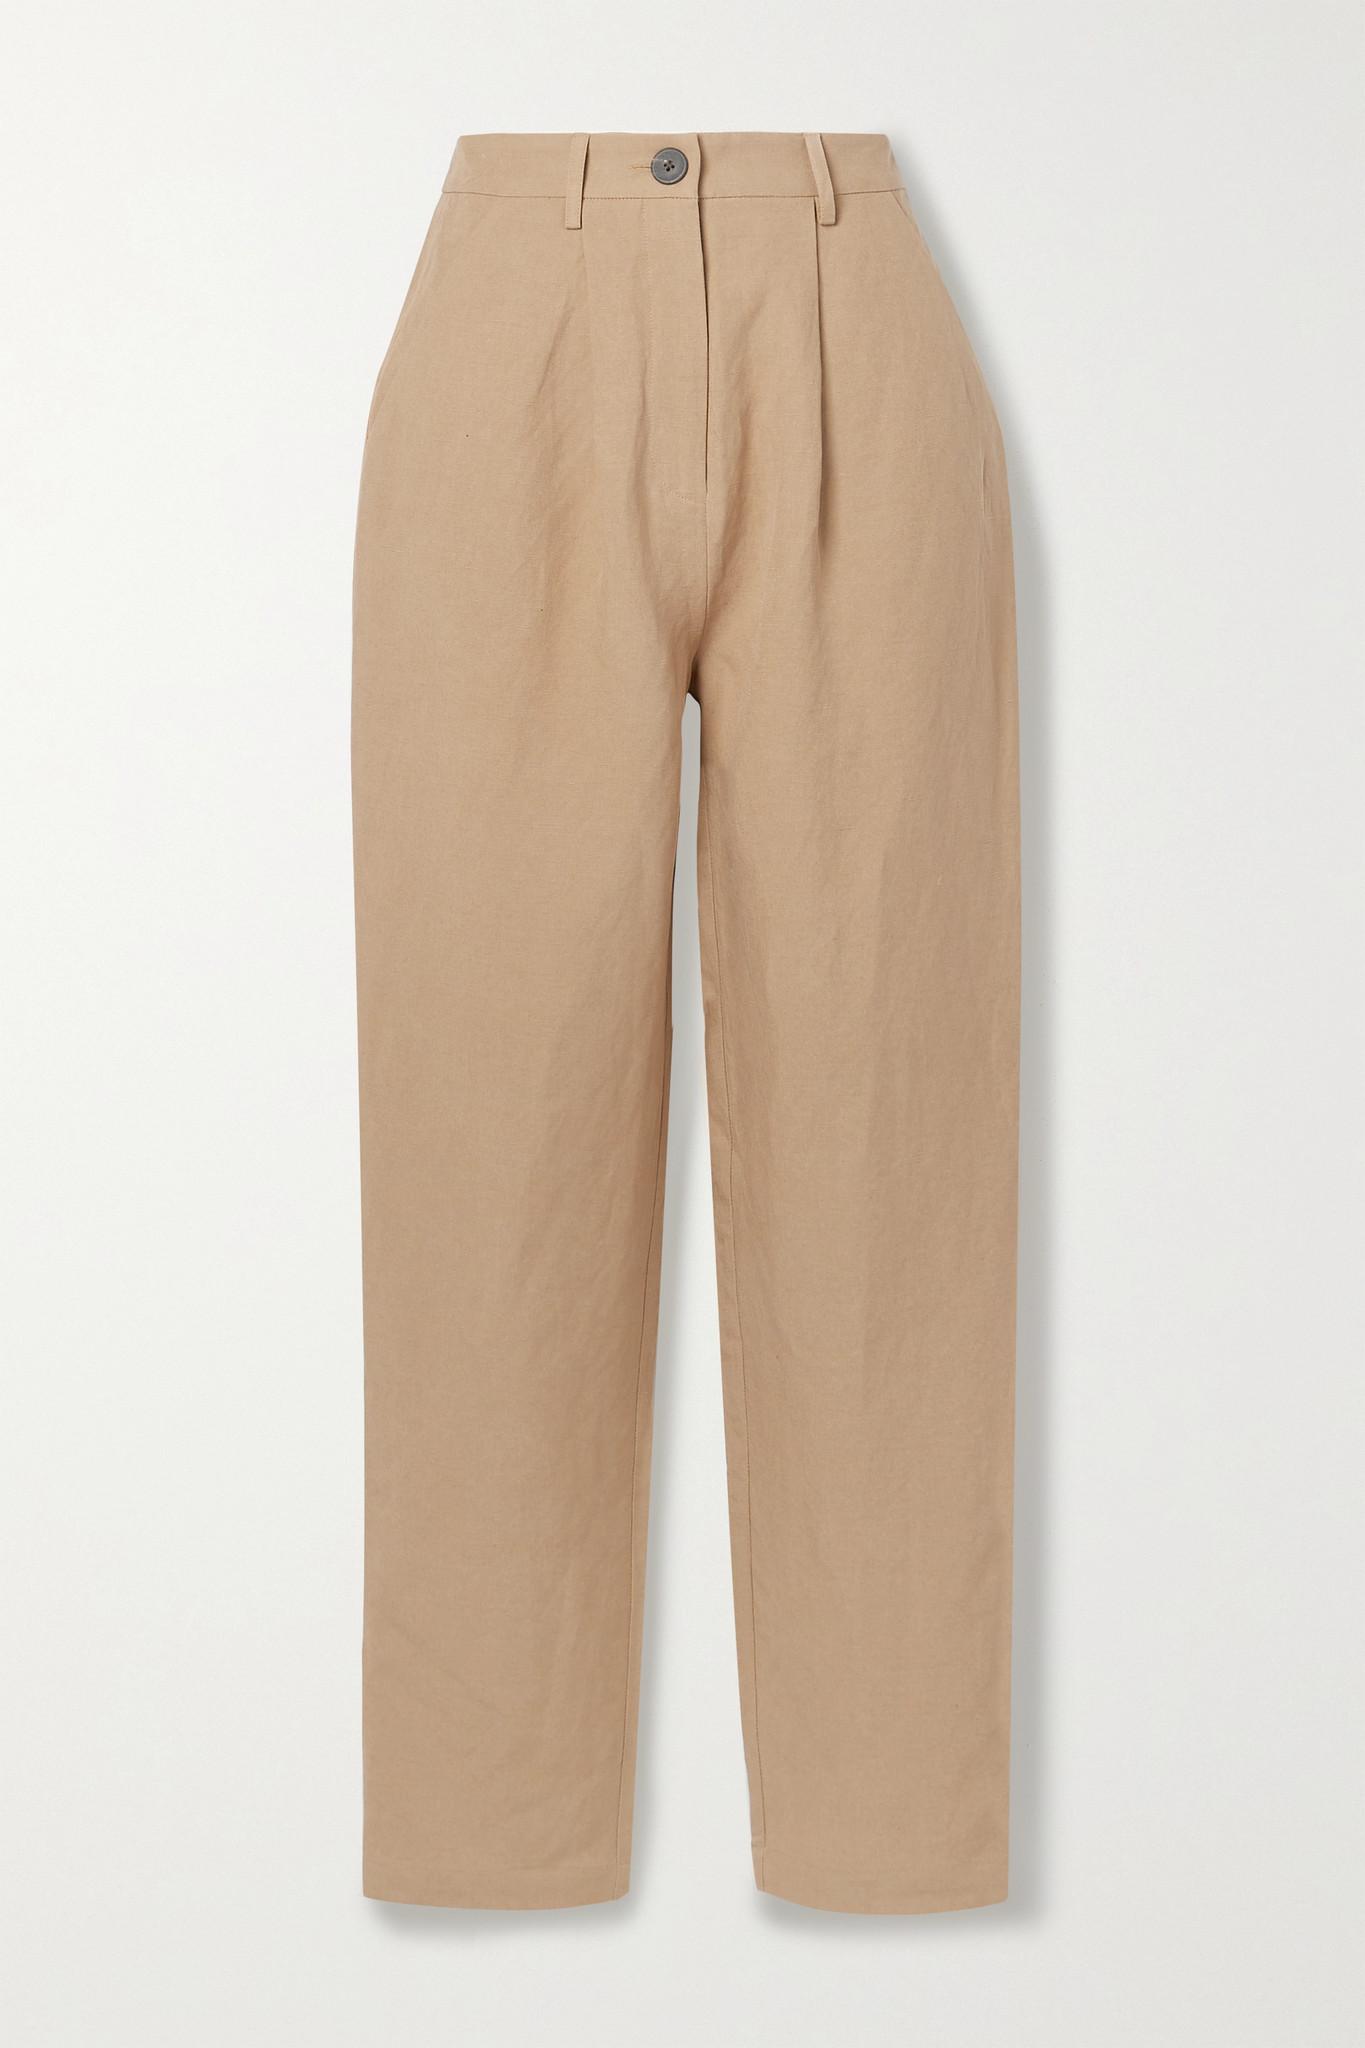 MARA HOFFMAN - + Net Sustain Dita Tencel And Linen-blend Straight-leg Pants - Brown - US00